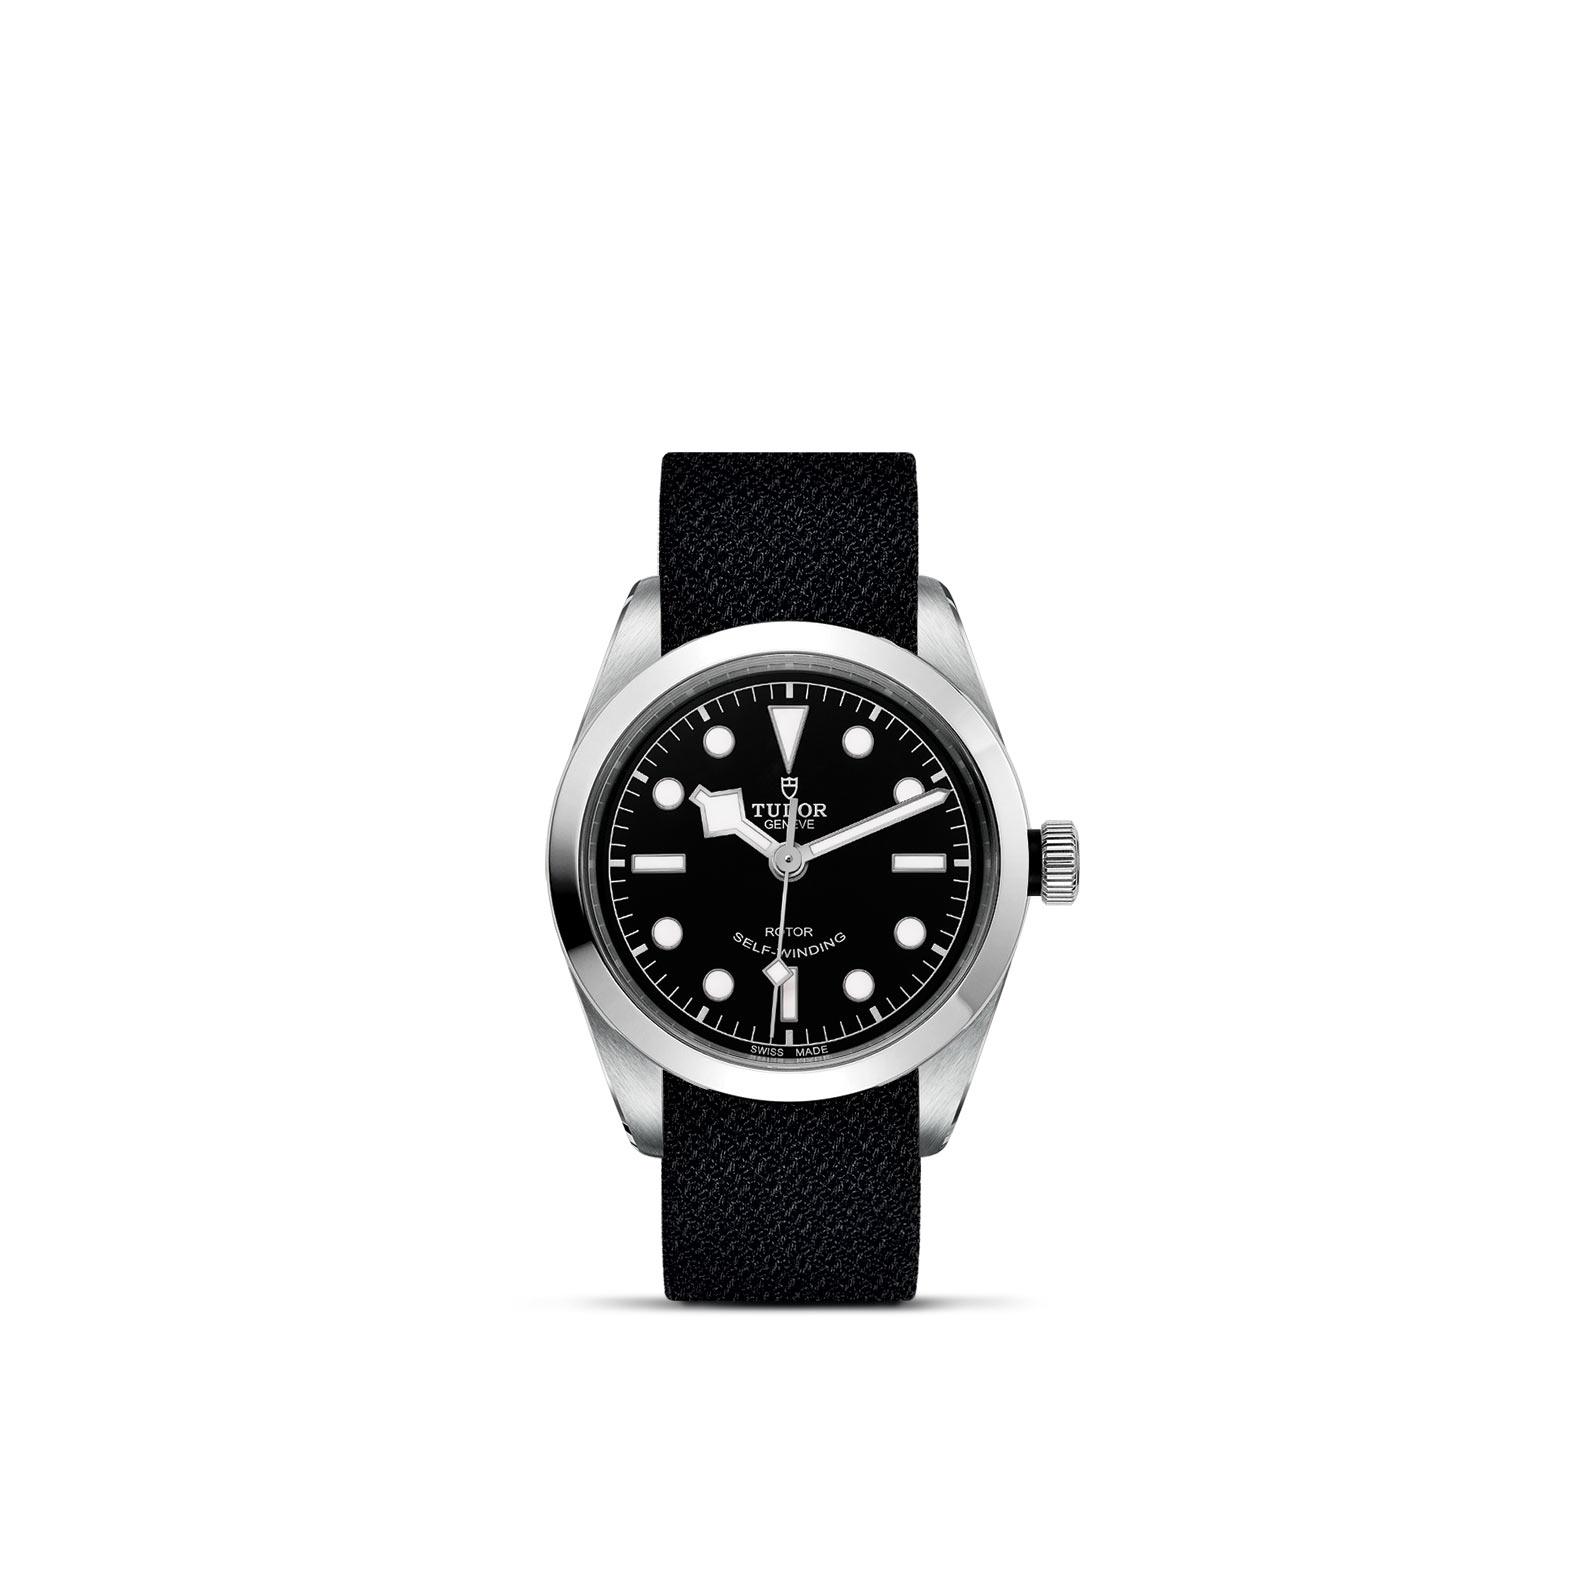 TUDOR Black Bay 36 M79500 0010 Upright